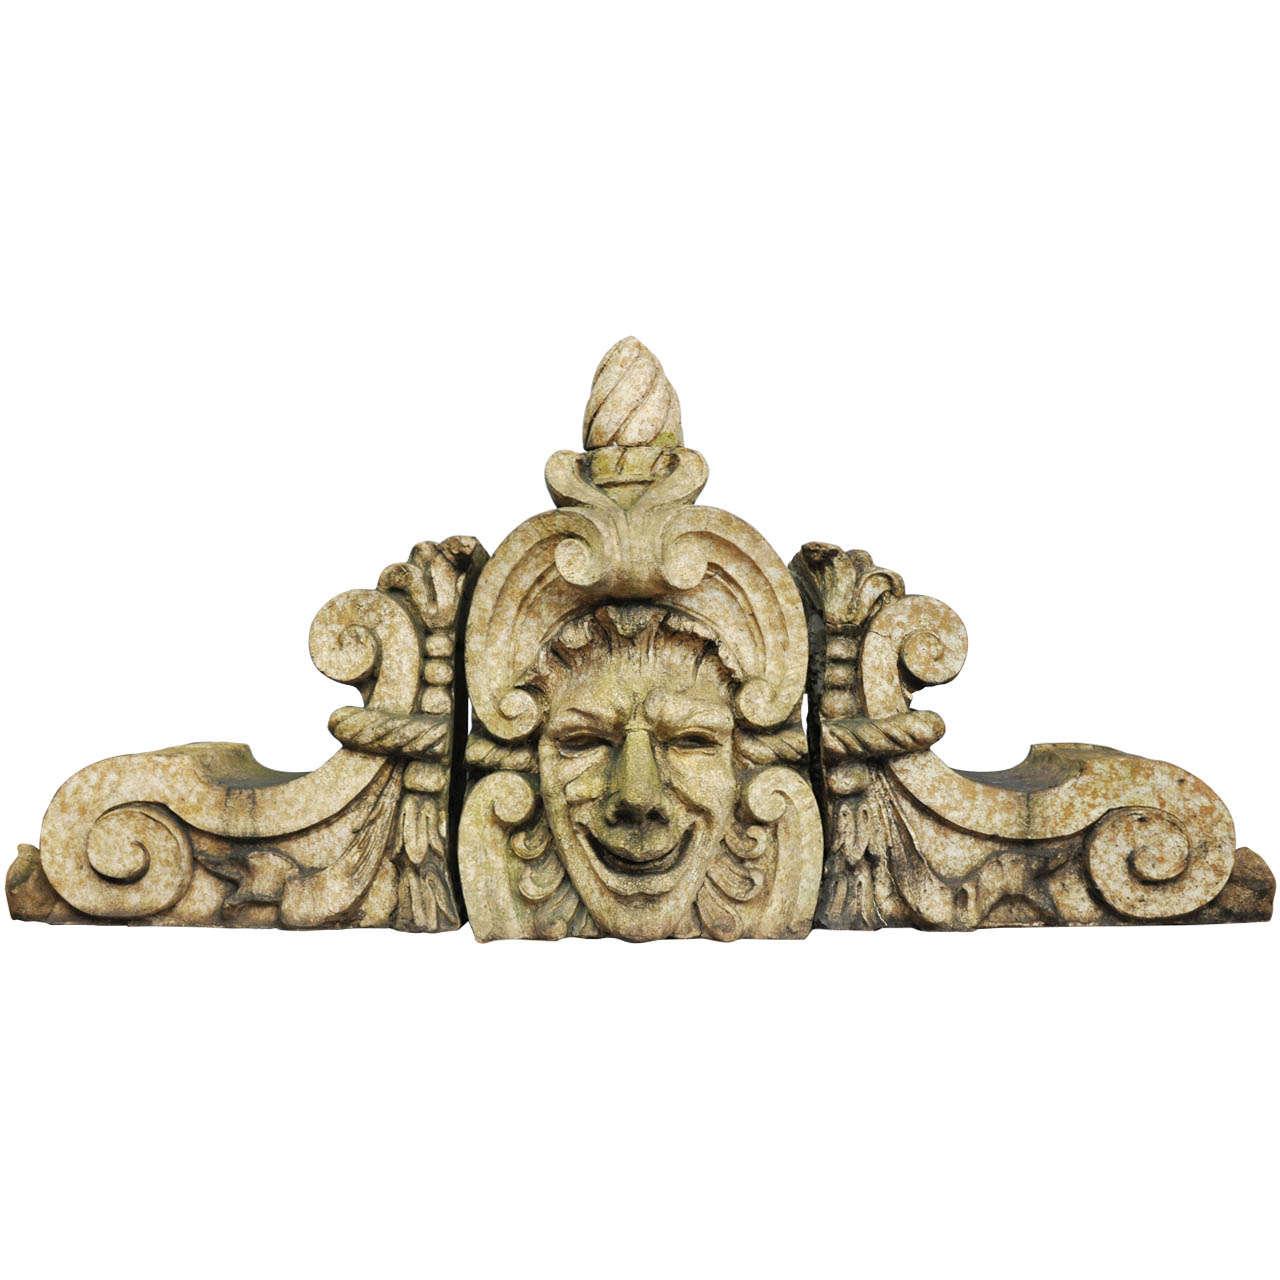 American Terracotta Building Ornament